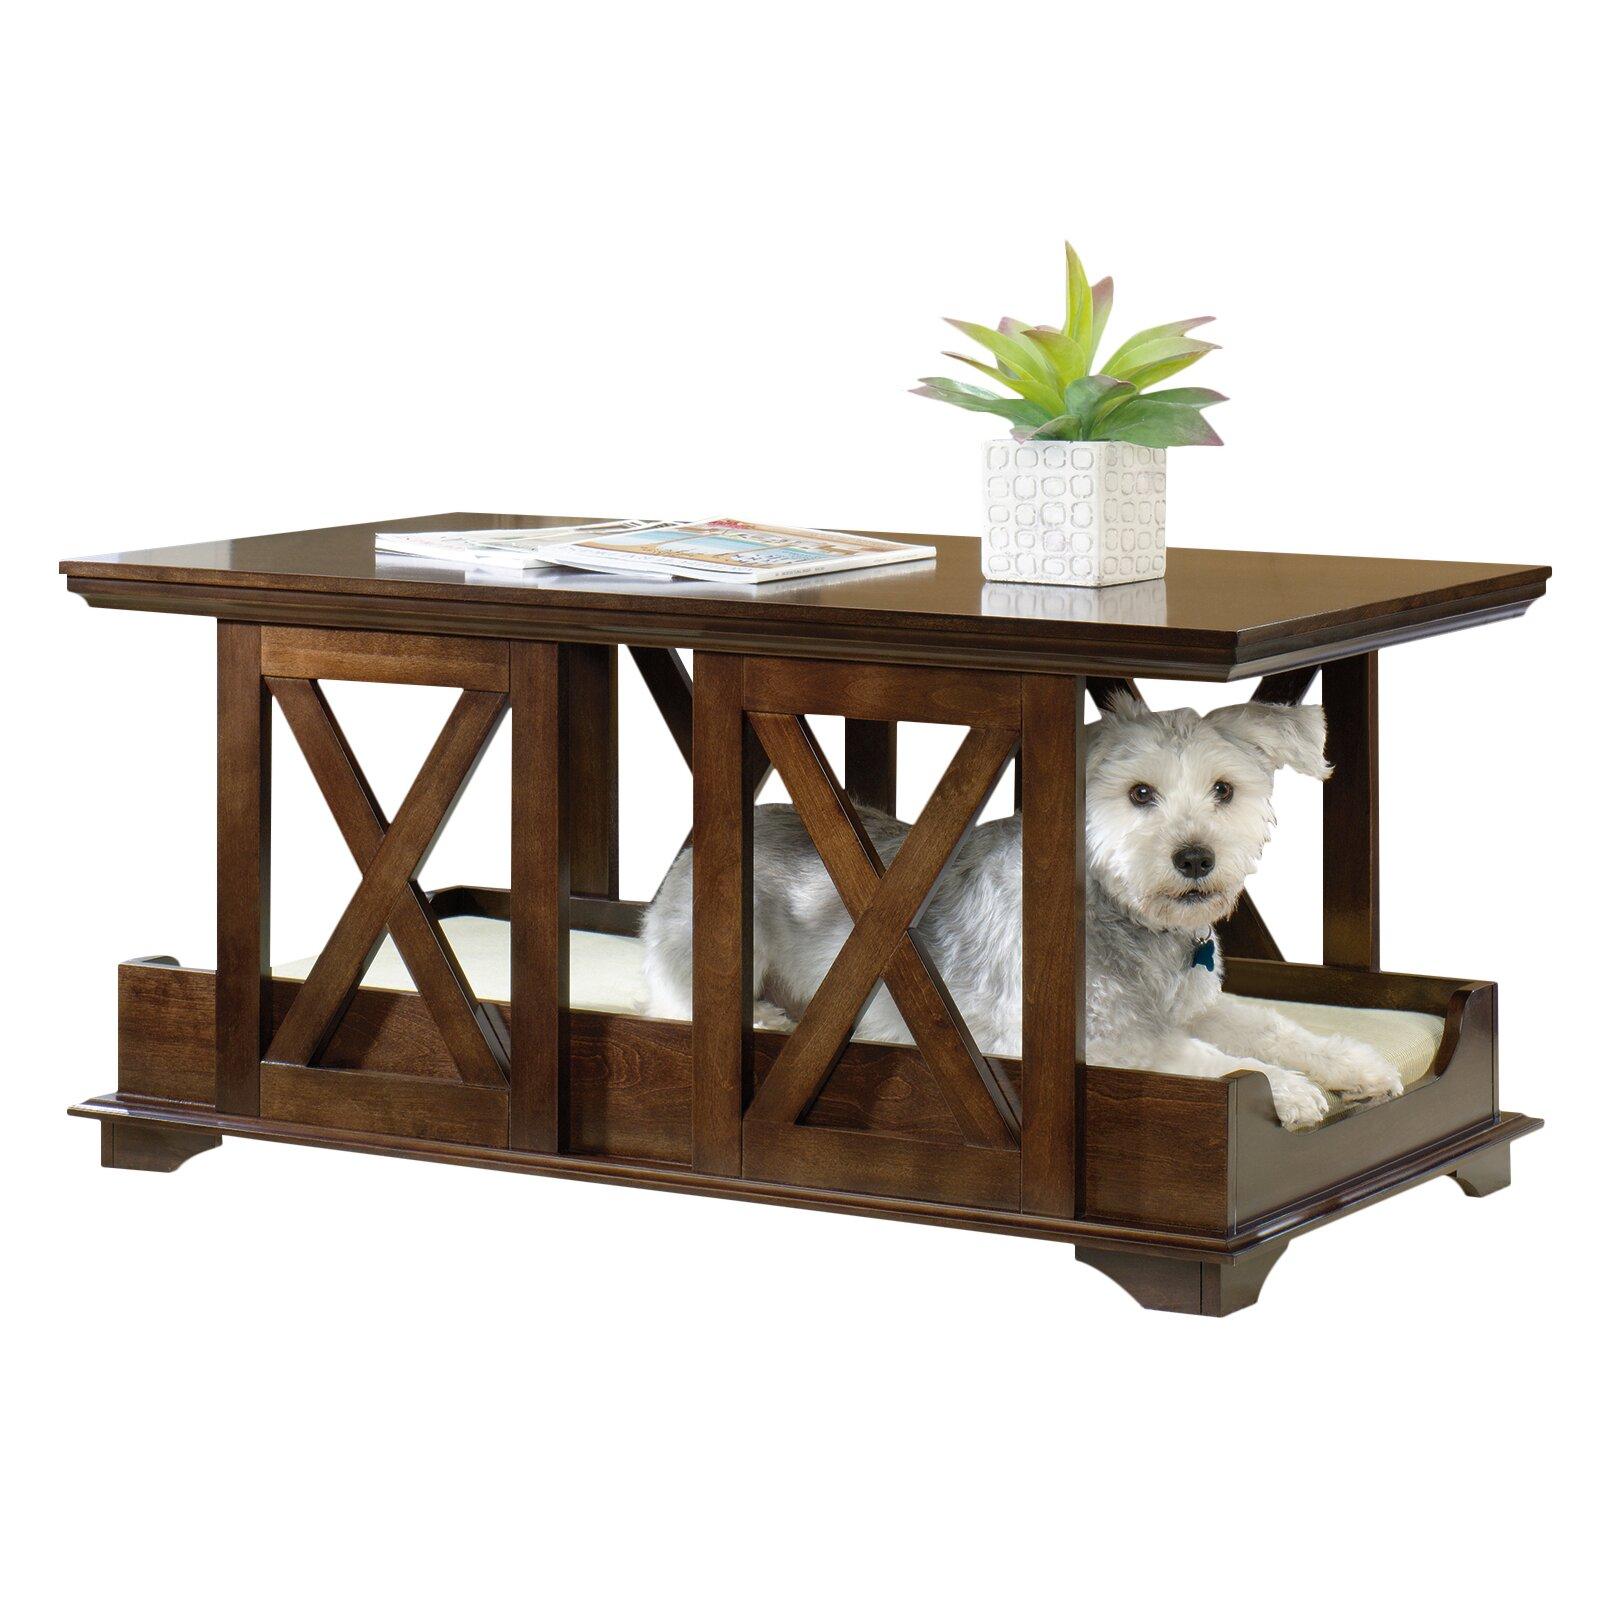 Sauder Bedroom Furniture Sauder Coffee Table Dog Bed Reviews Wayfair